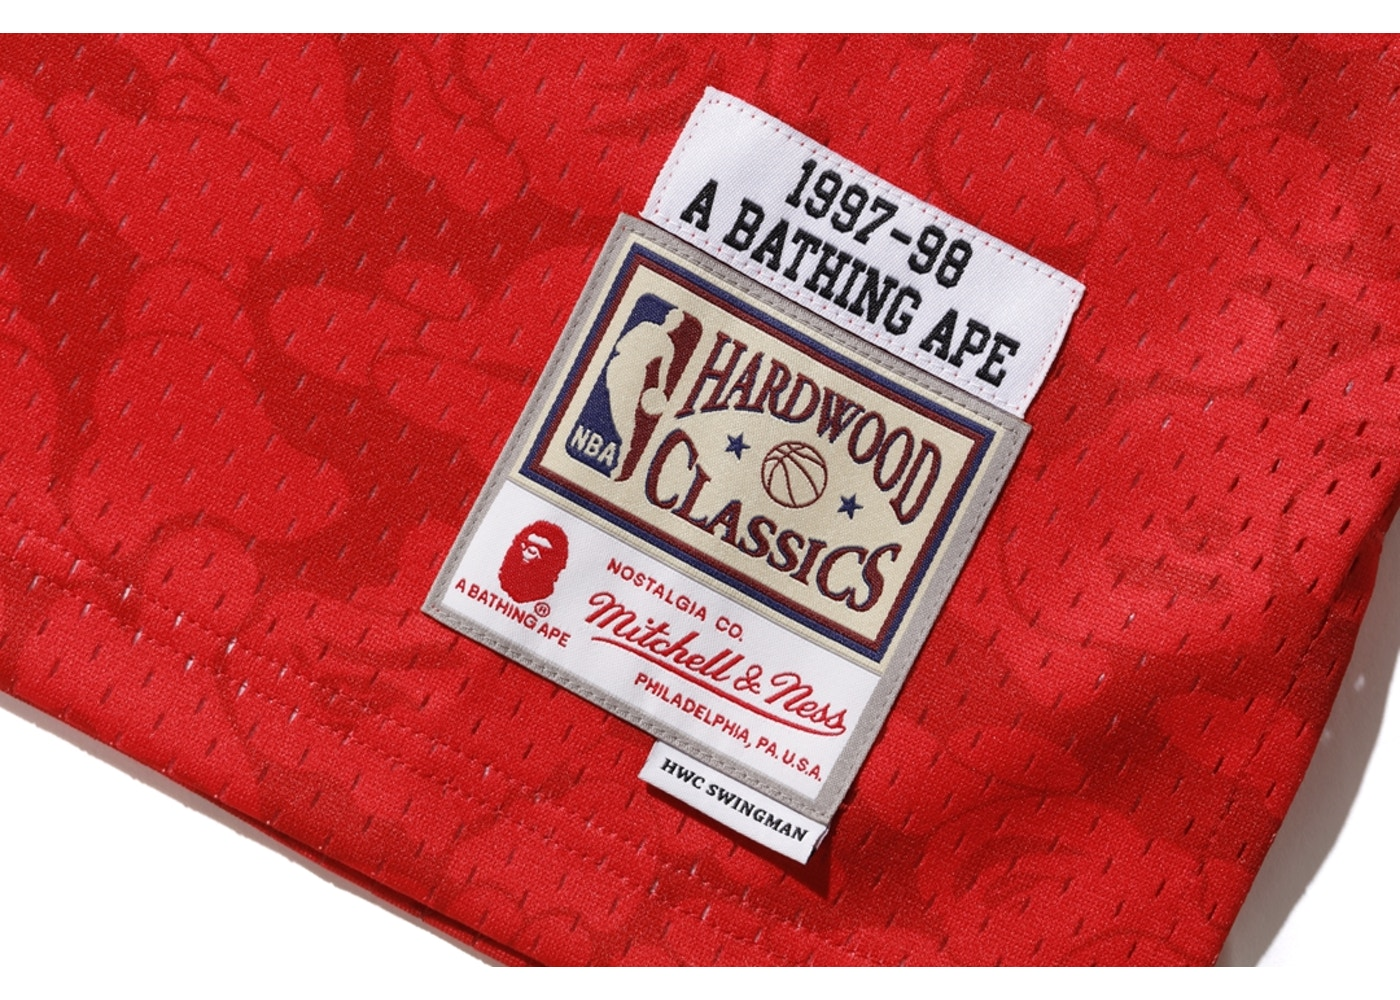 633f1943193 BAPE x Mitchell & Ness Bulls ABC Basketball Swingman Jersey Red - FW18